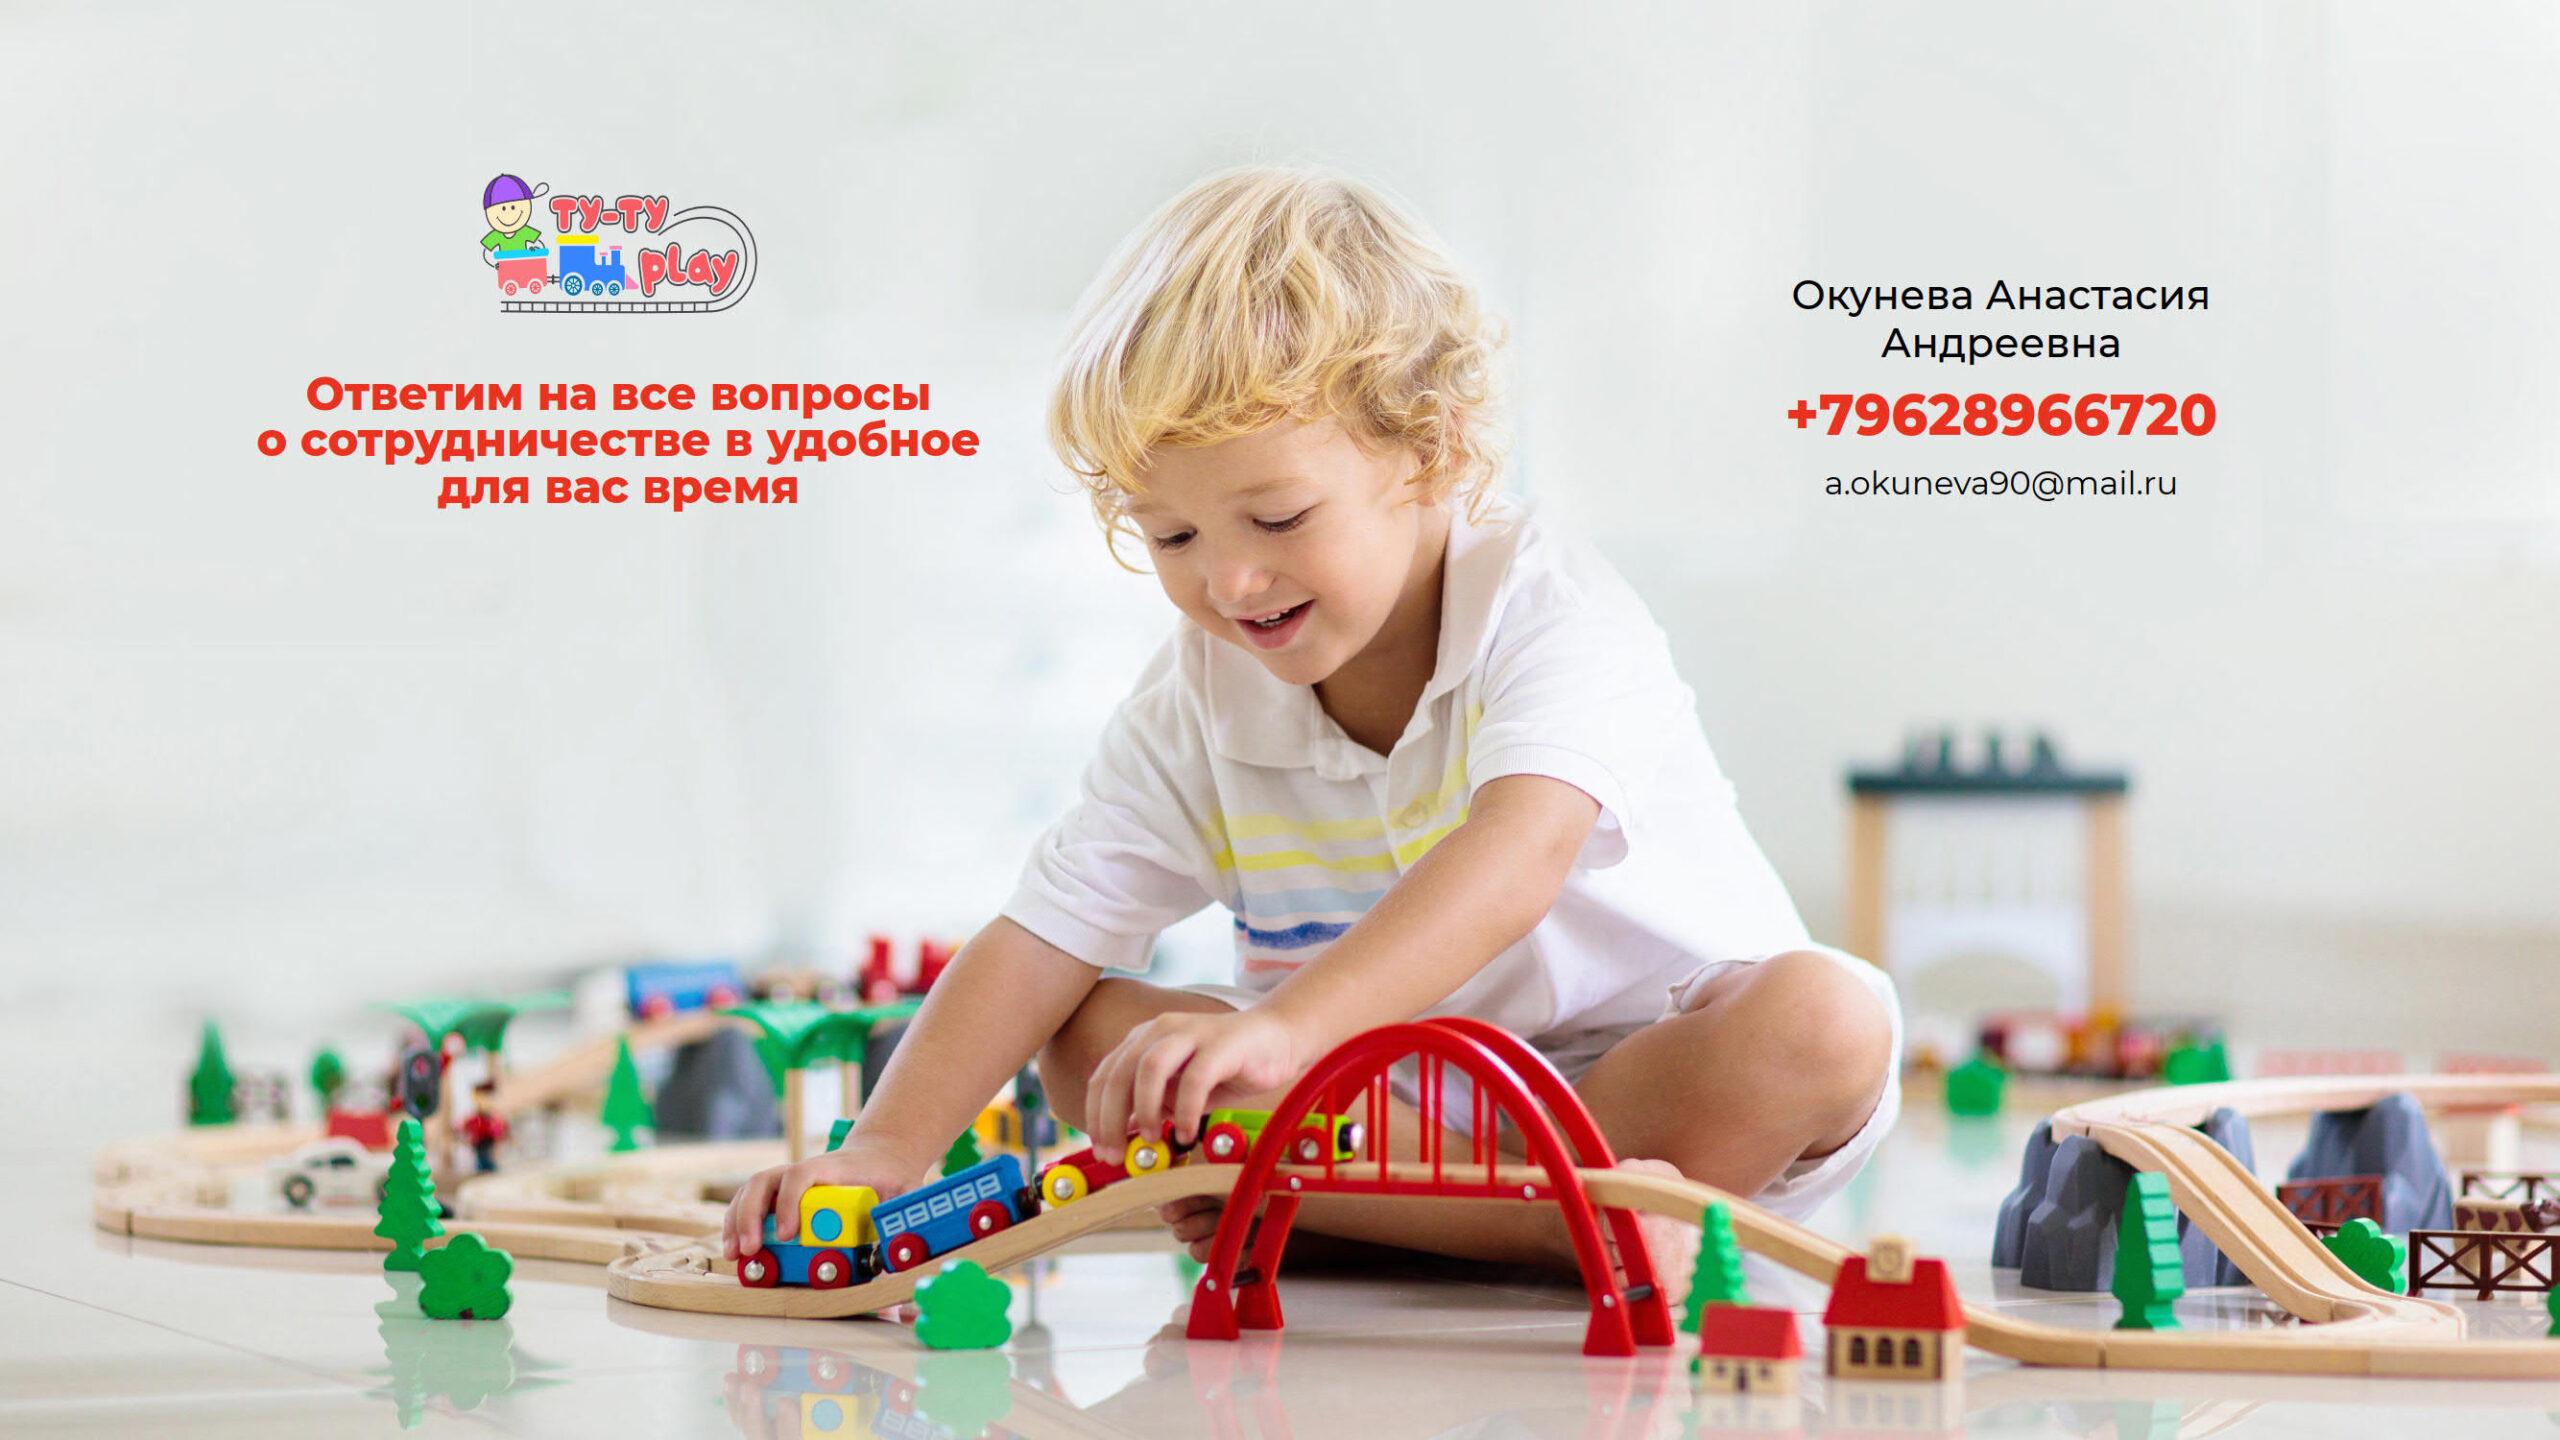 Prezentacija-detskogo-igrovogo-ostrovka-dlja-TRC-kontakty